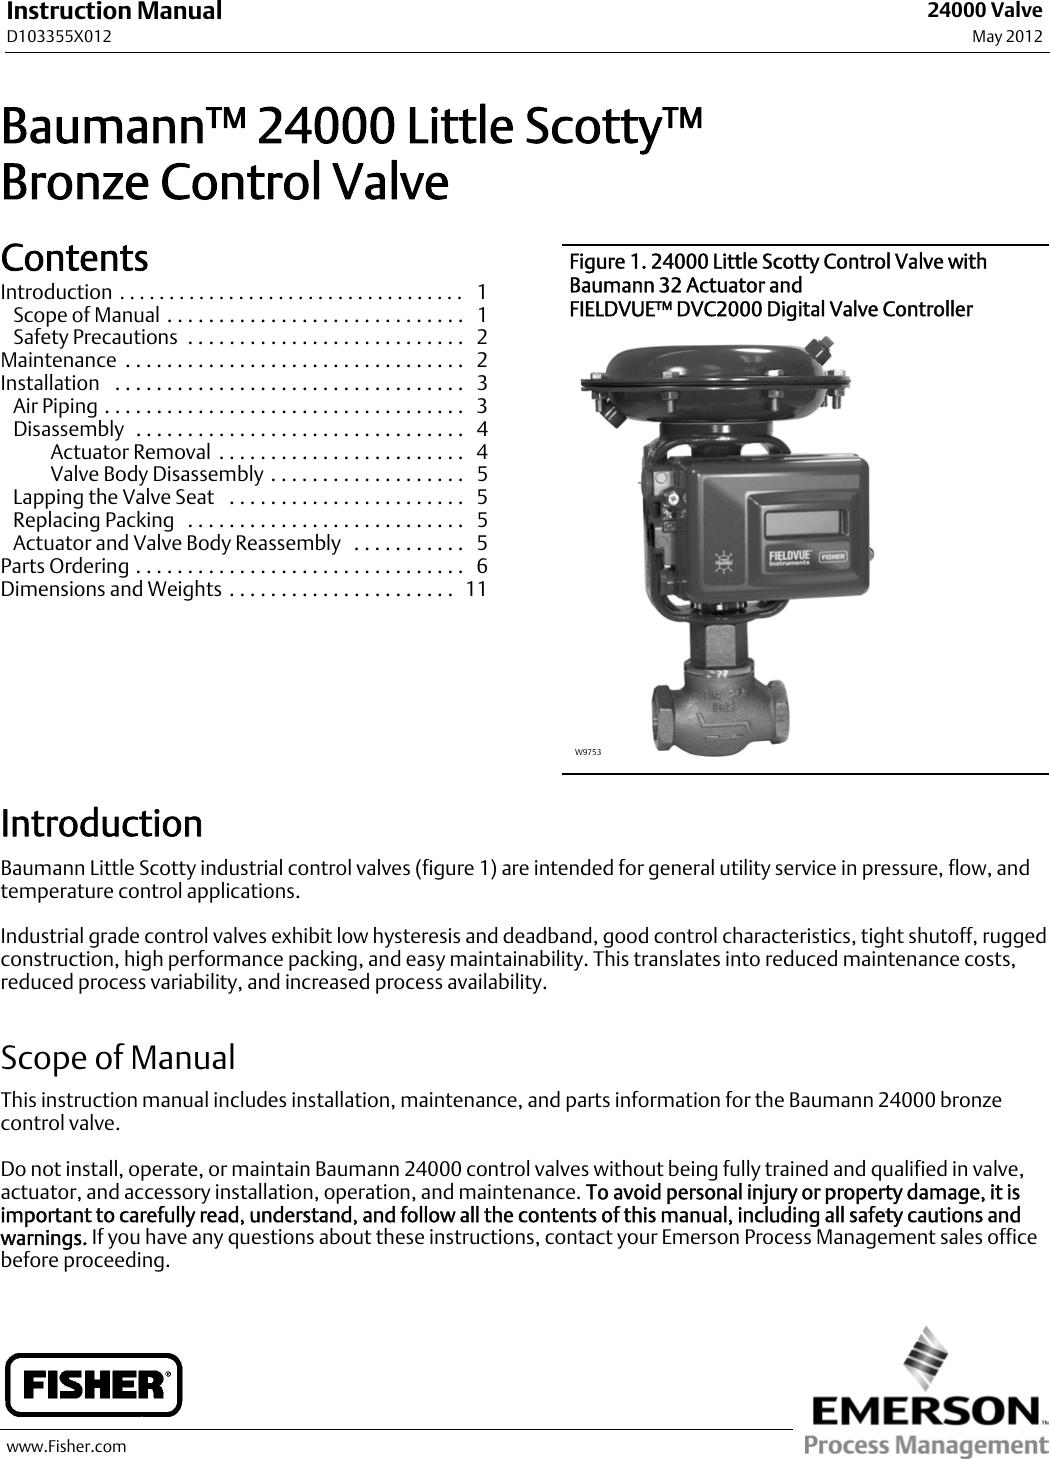 Emerson Fisher Baumann 24000 Instruction Manual